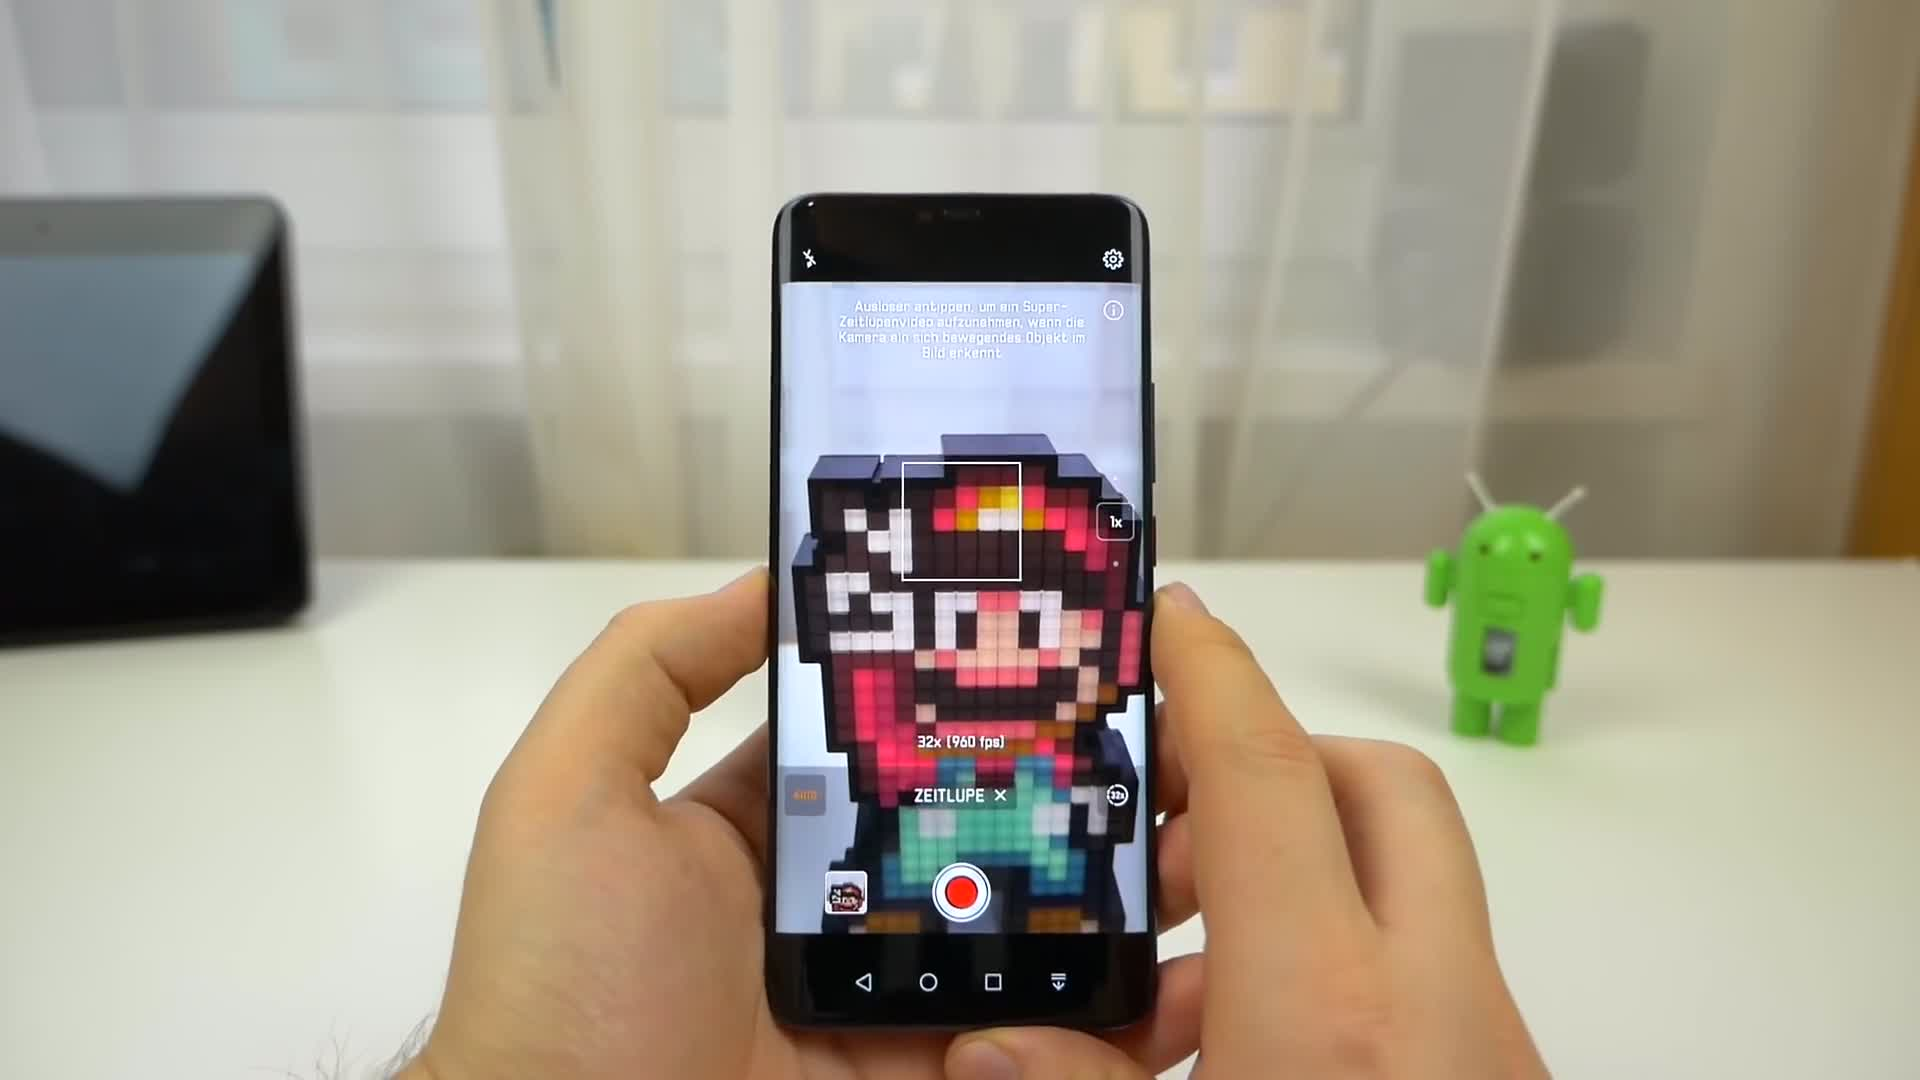 Smartphone, Android, Huawei, Kamera, Fotografie, Daniil Matzkuhn, tblt, Huawei Mate 20, Huawei Mate 20 Pro, Huawei Mate, Tipps und Tricks, Kamera-App, Mate 20 Pro